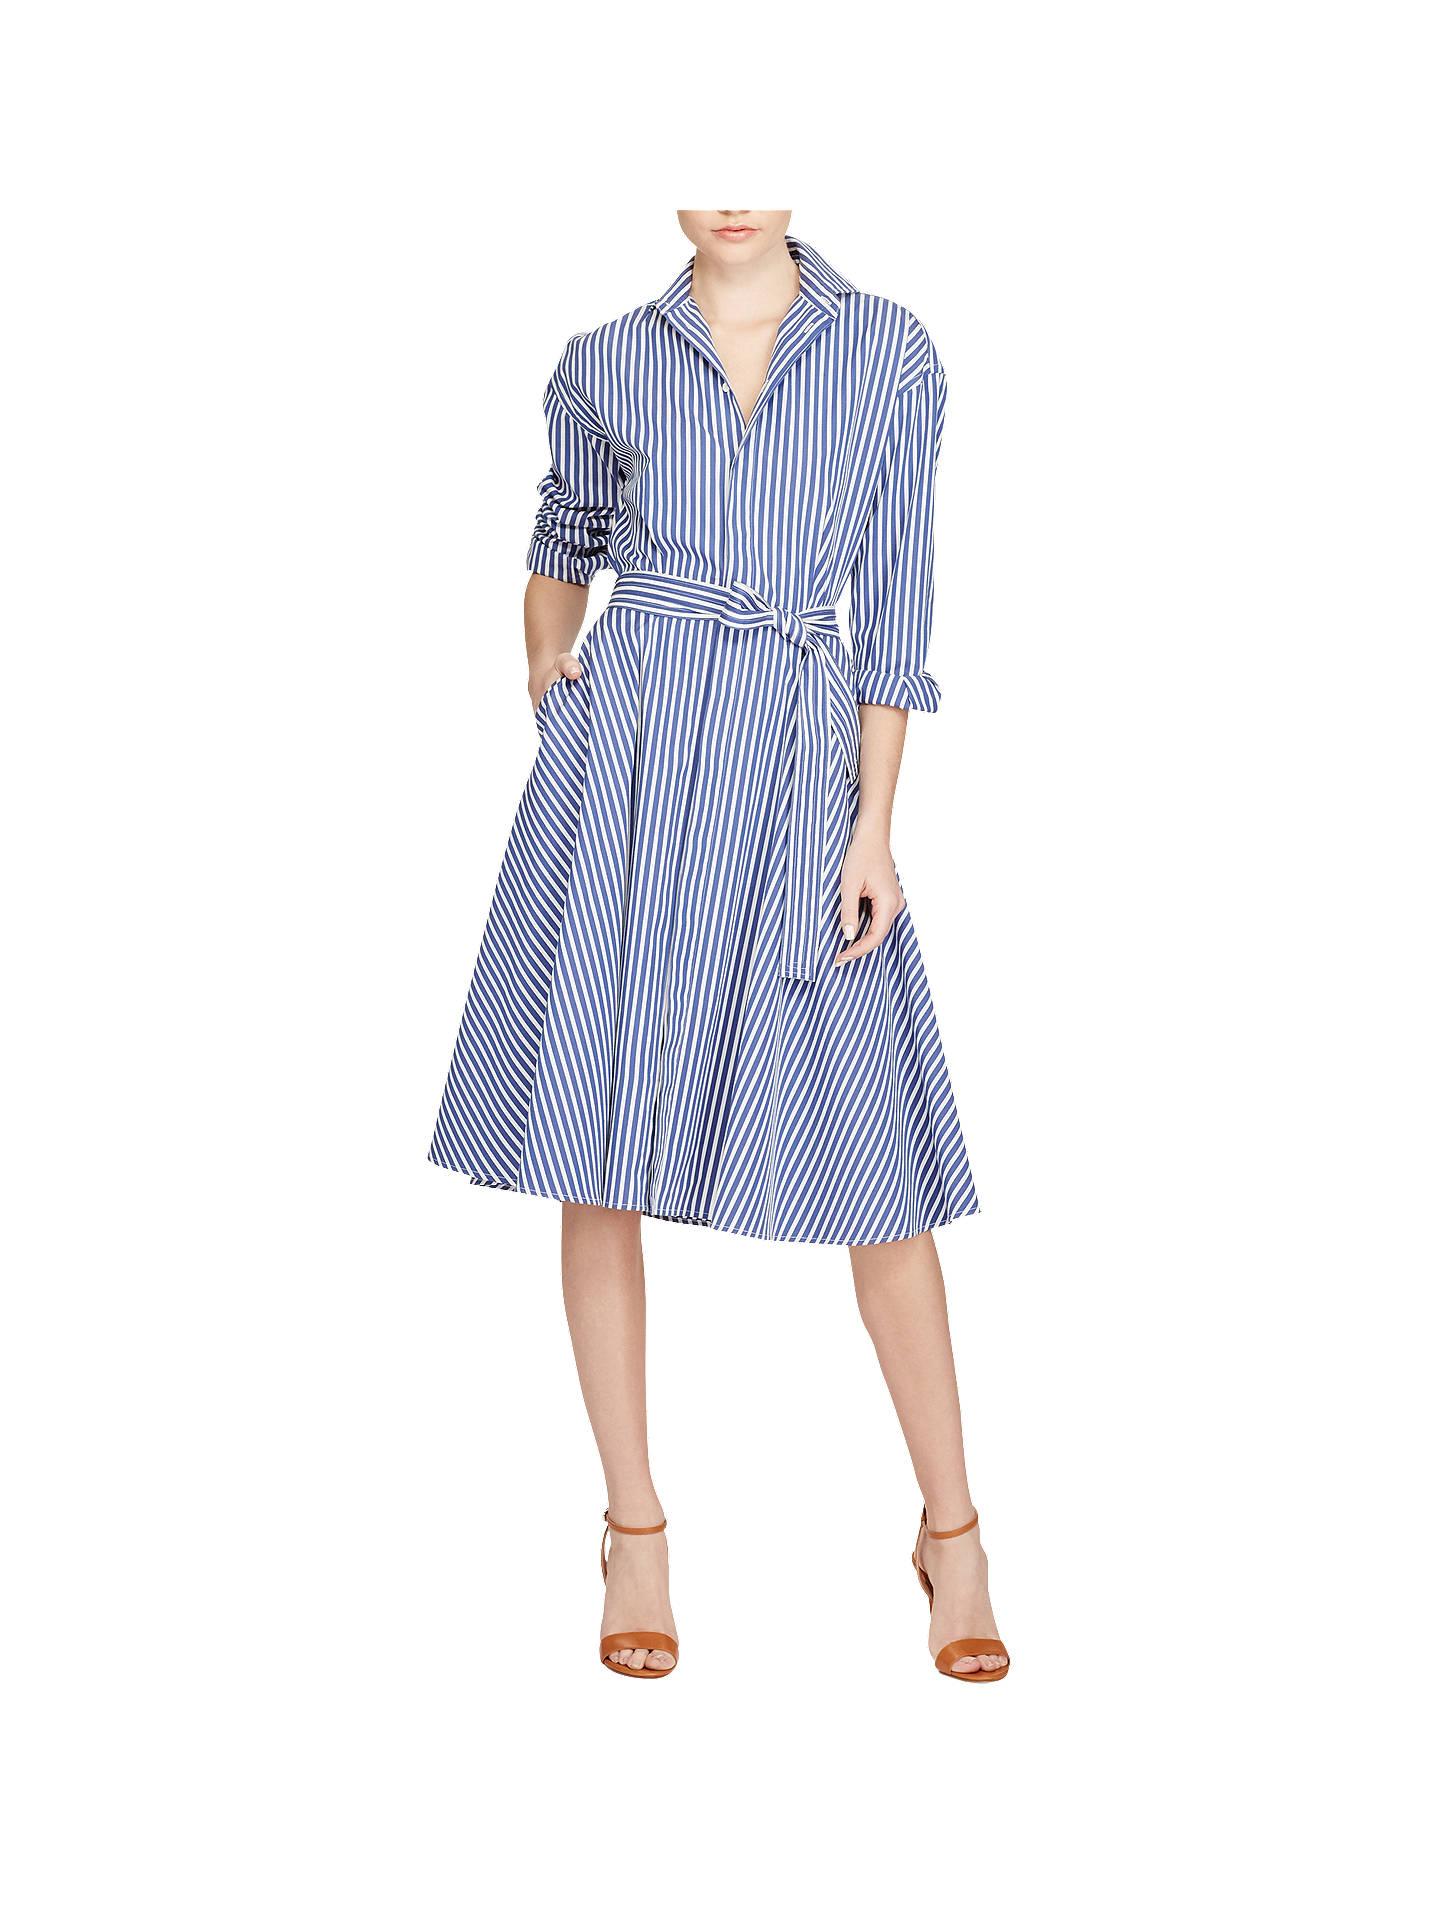 5df7438a3ba7 Buy Polo Ralph Lauren Striped Cotton Shirt Dress